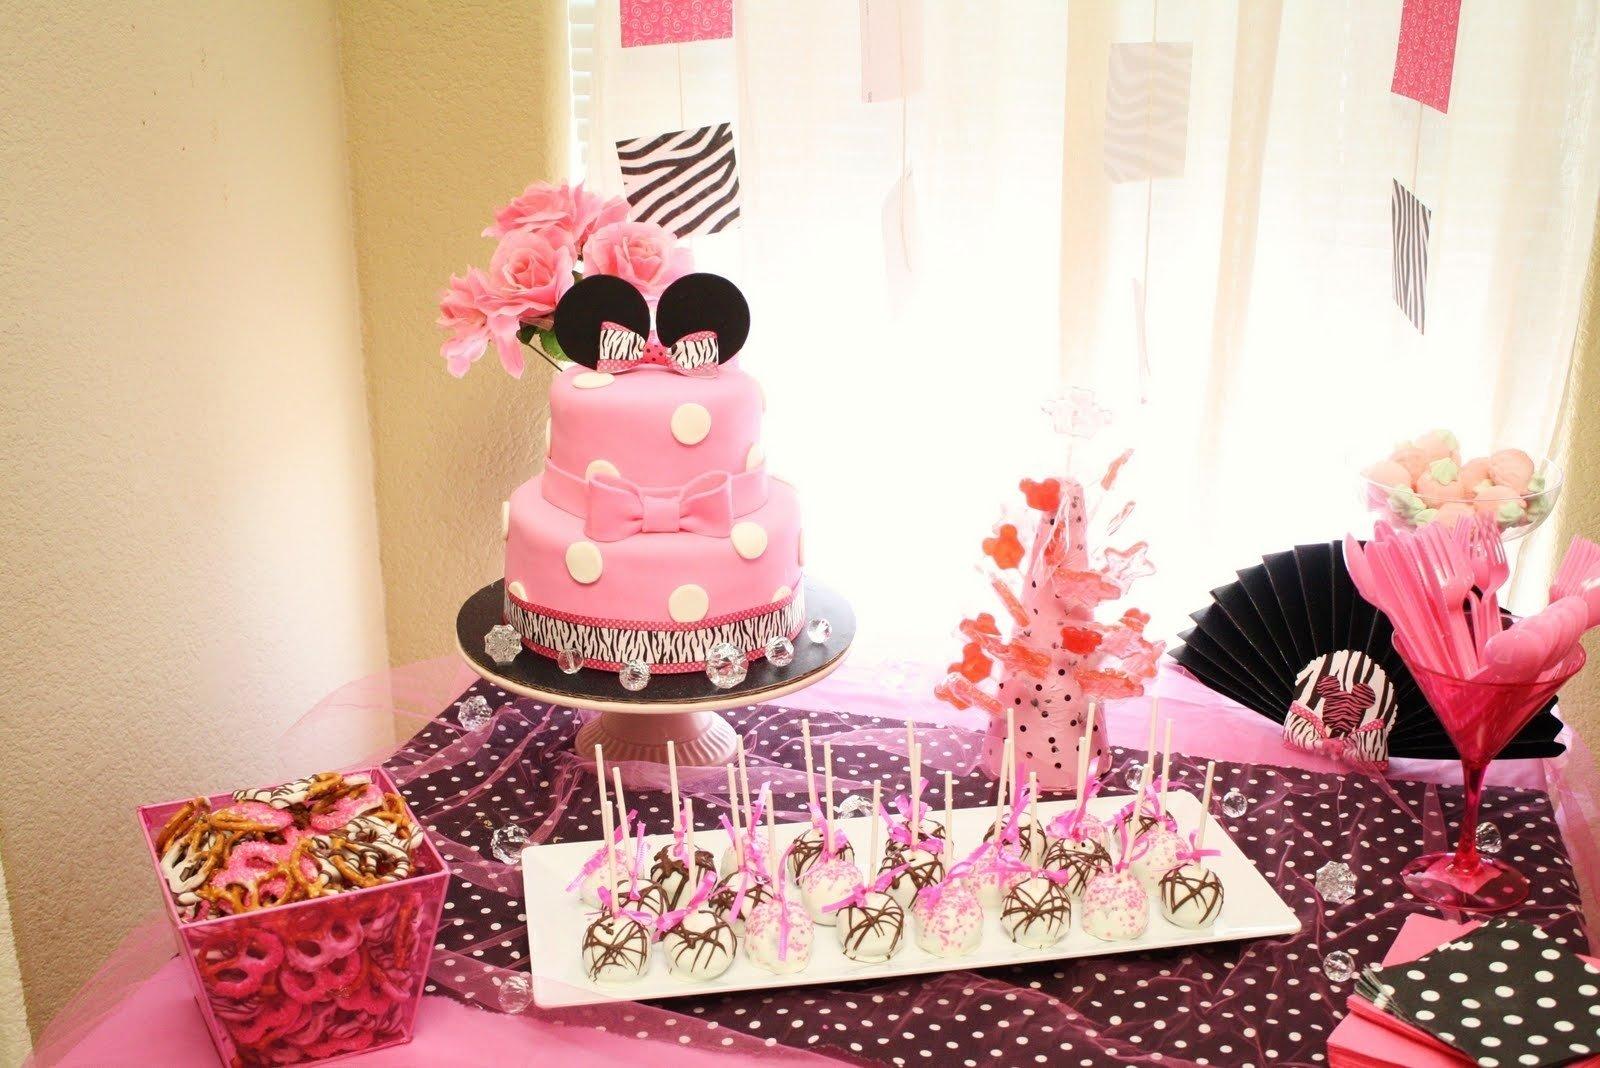 10 Wonderful Minnie Mouse 1St Birthday Ideas minnie mouse birthday ideas diy minnie mouse decoration ideas for 1 2020